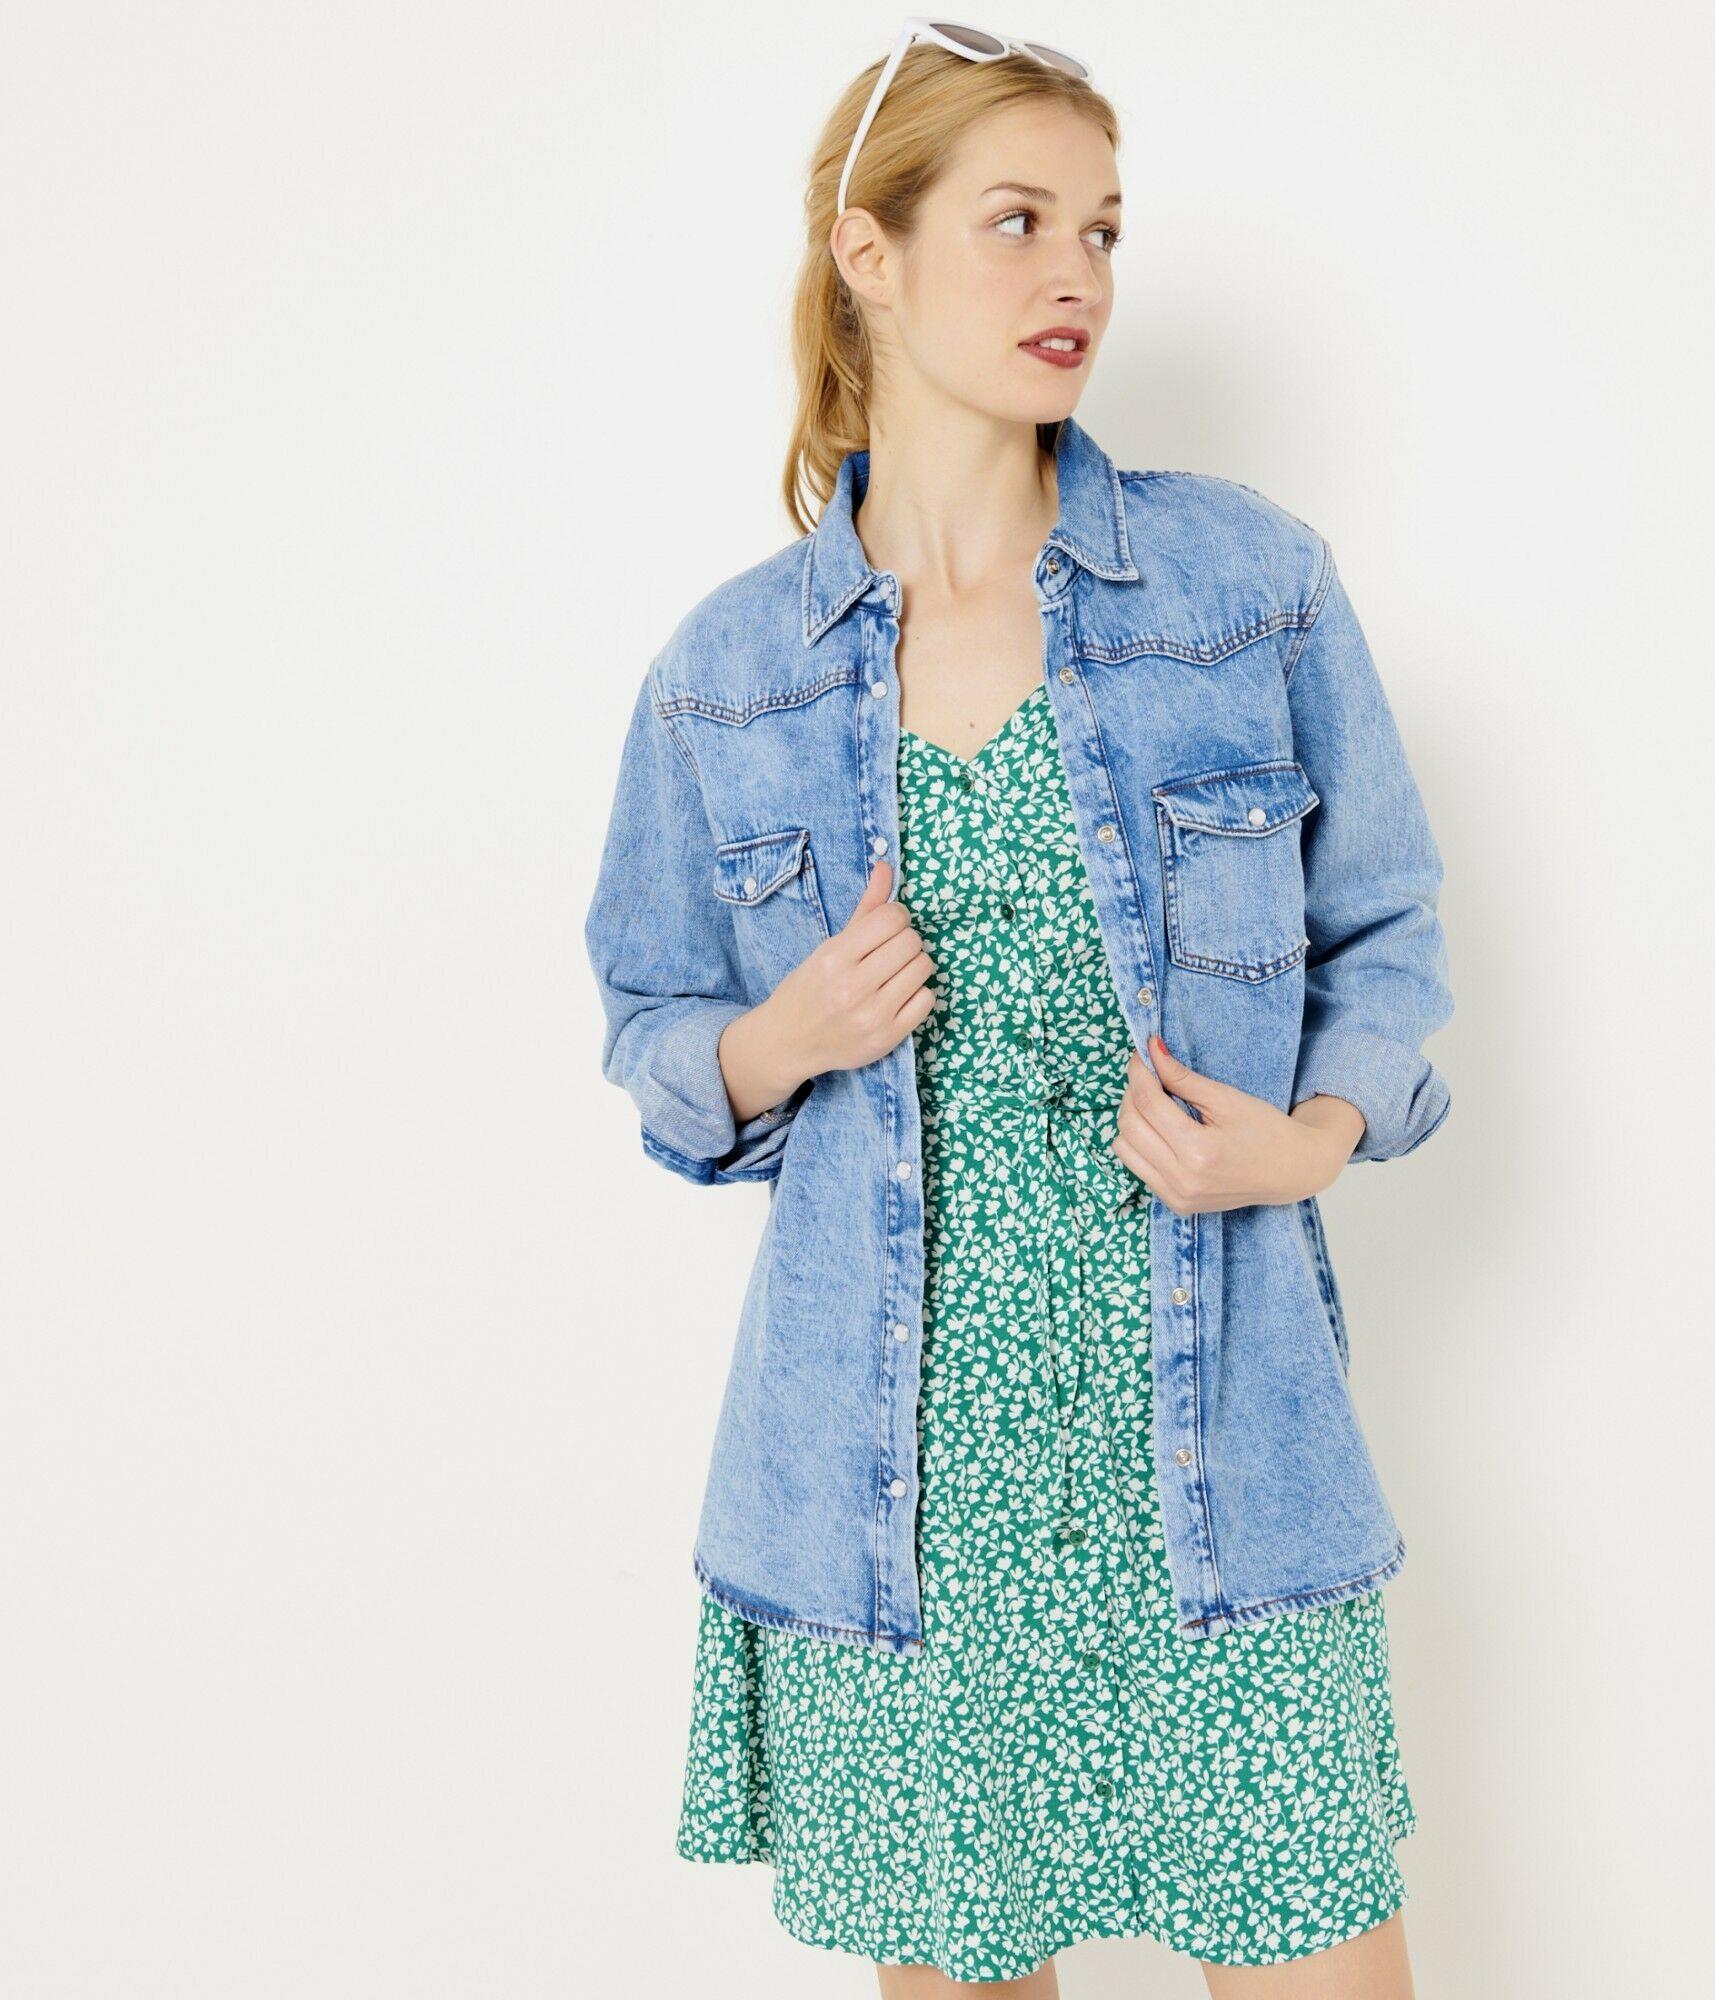 CAMAIEU Damska kurtka dżinsowa niebieski